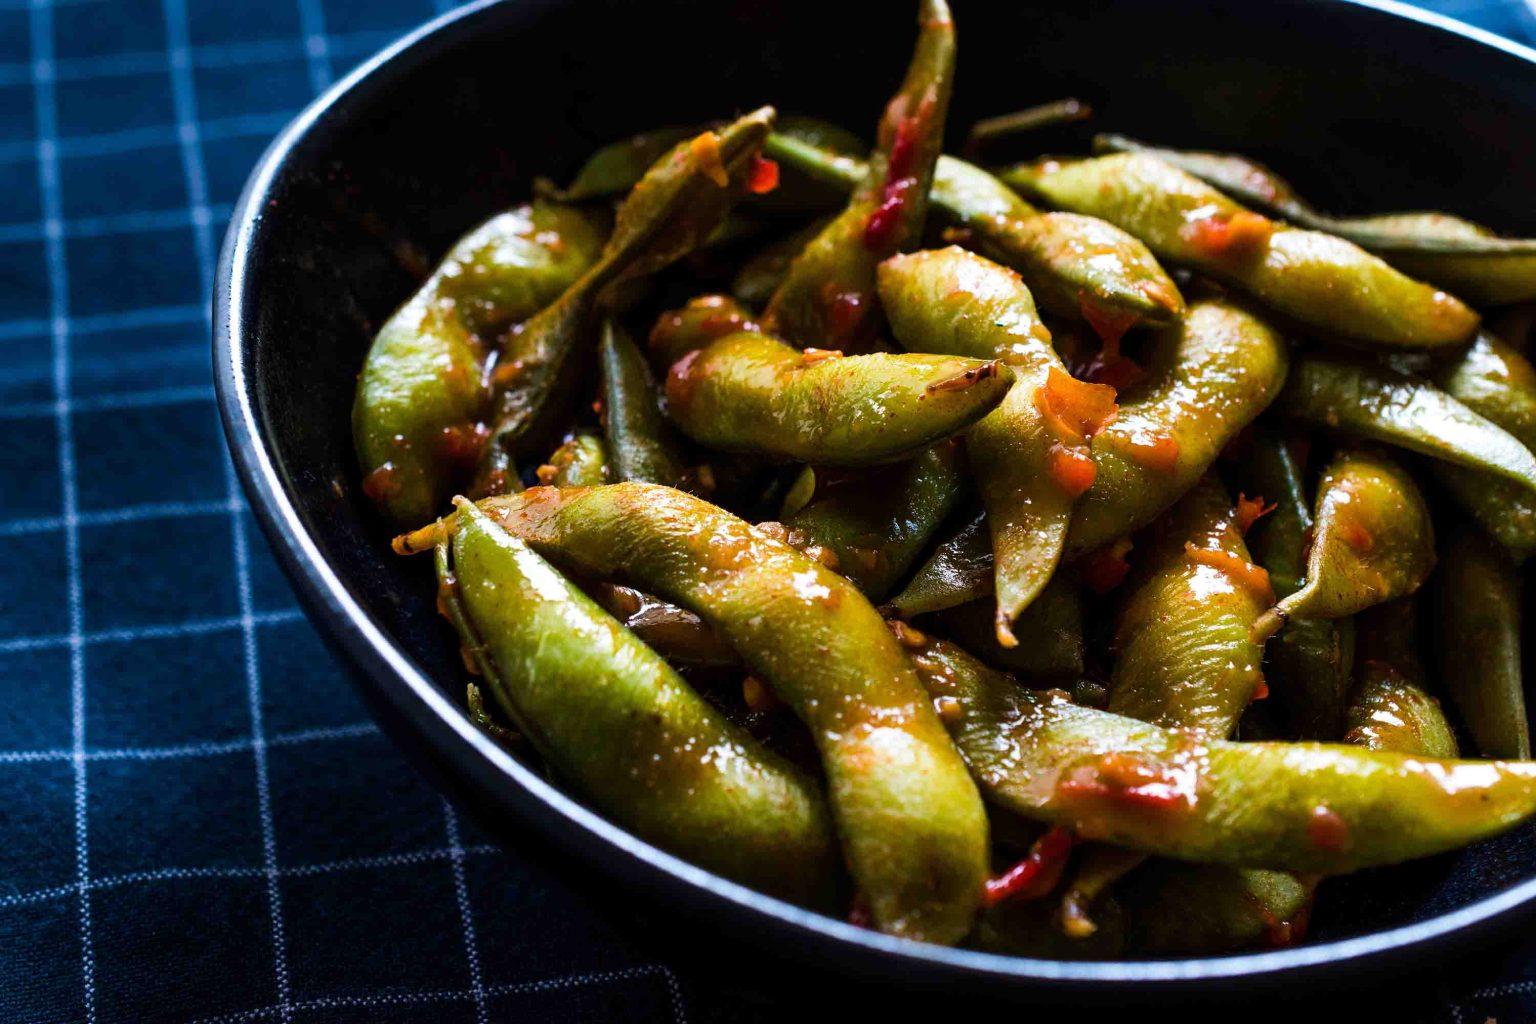 Spicy Edamame with Sambal Oelek sauce